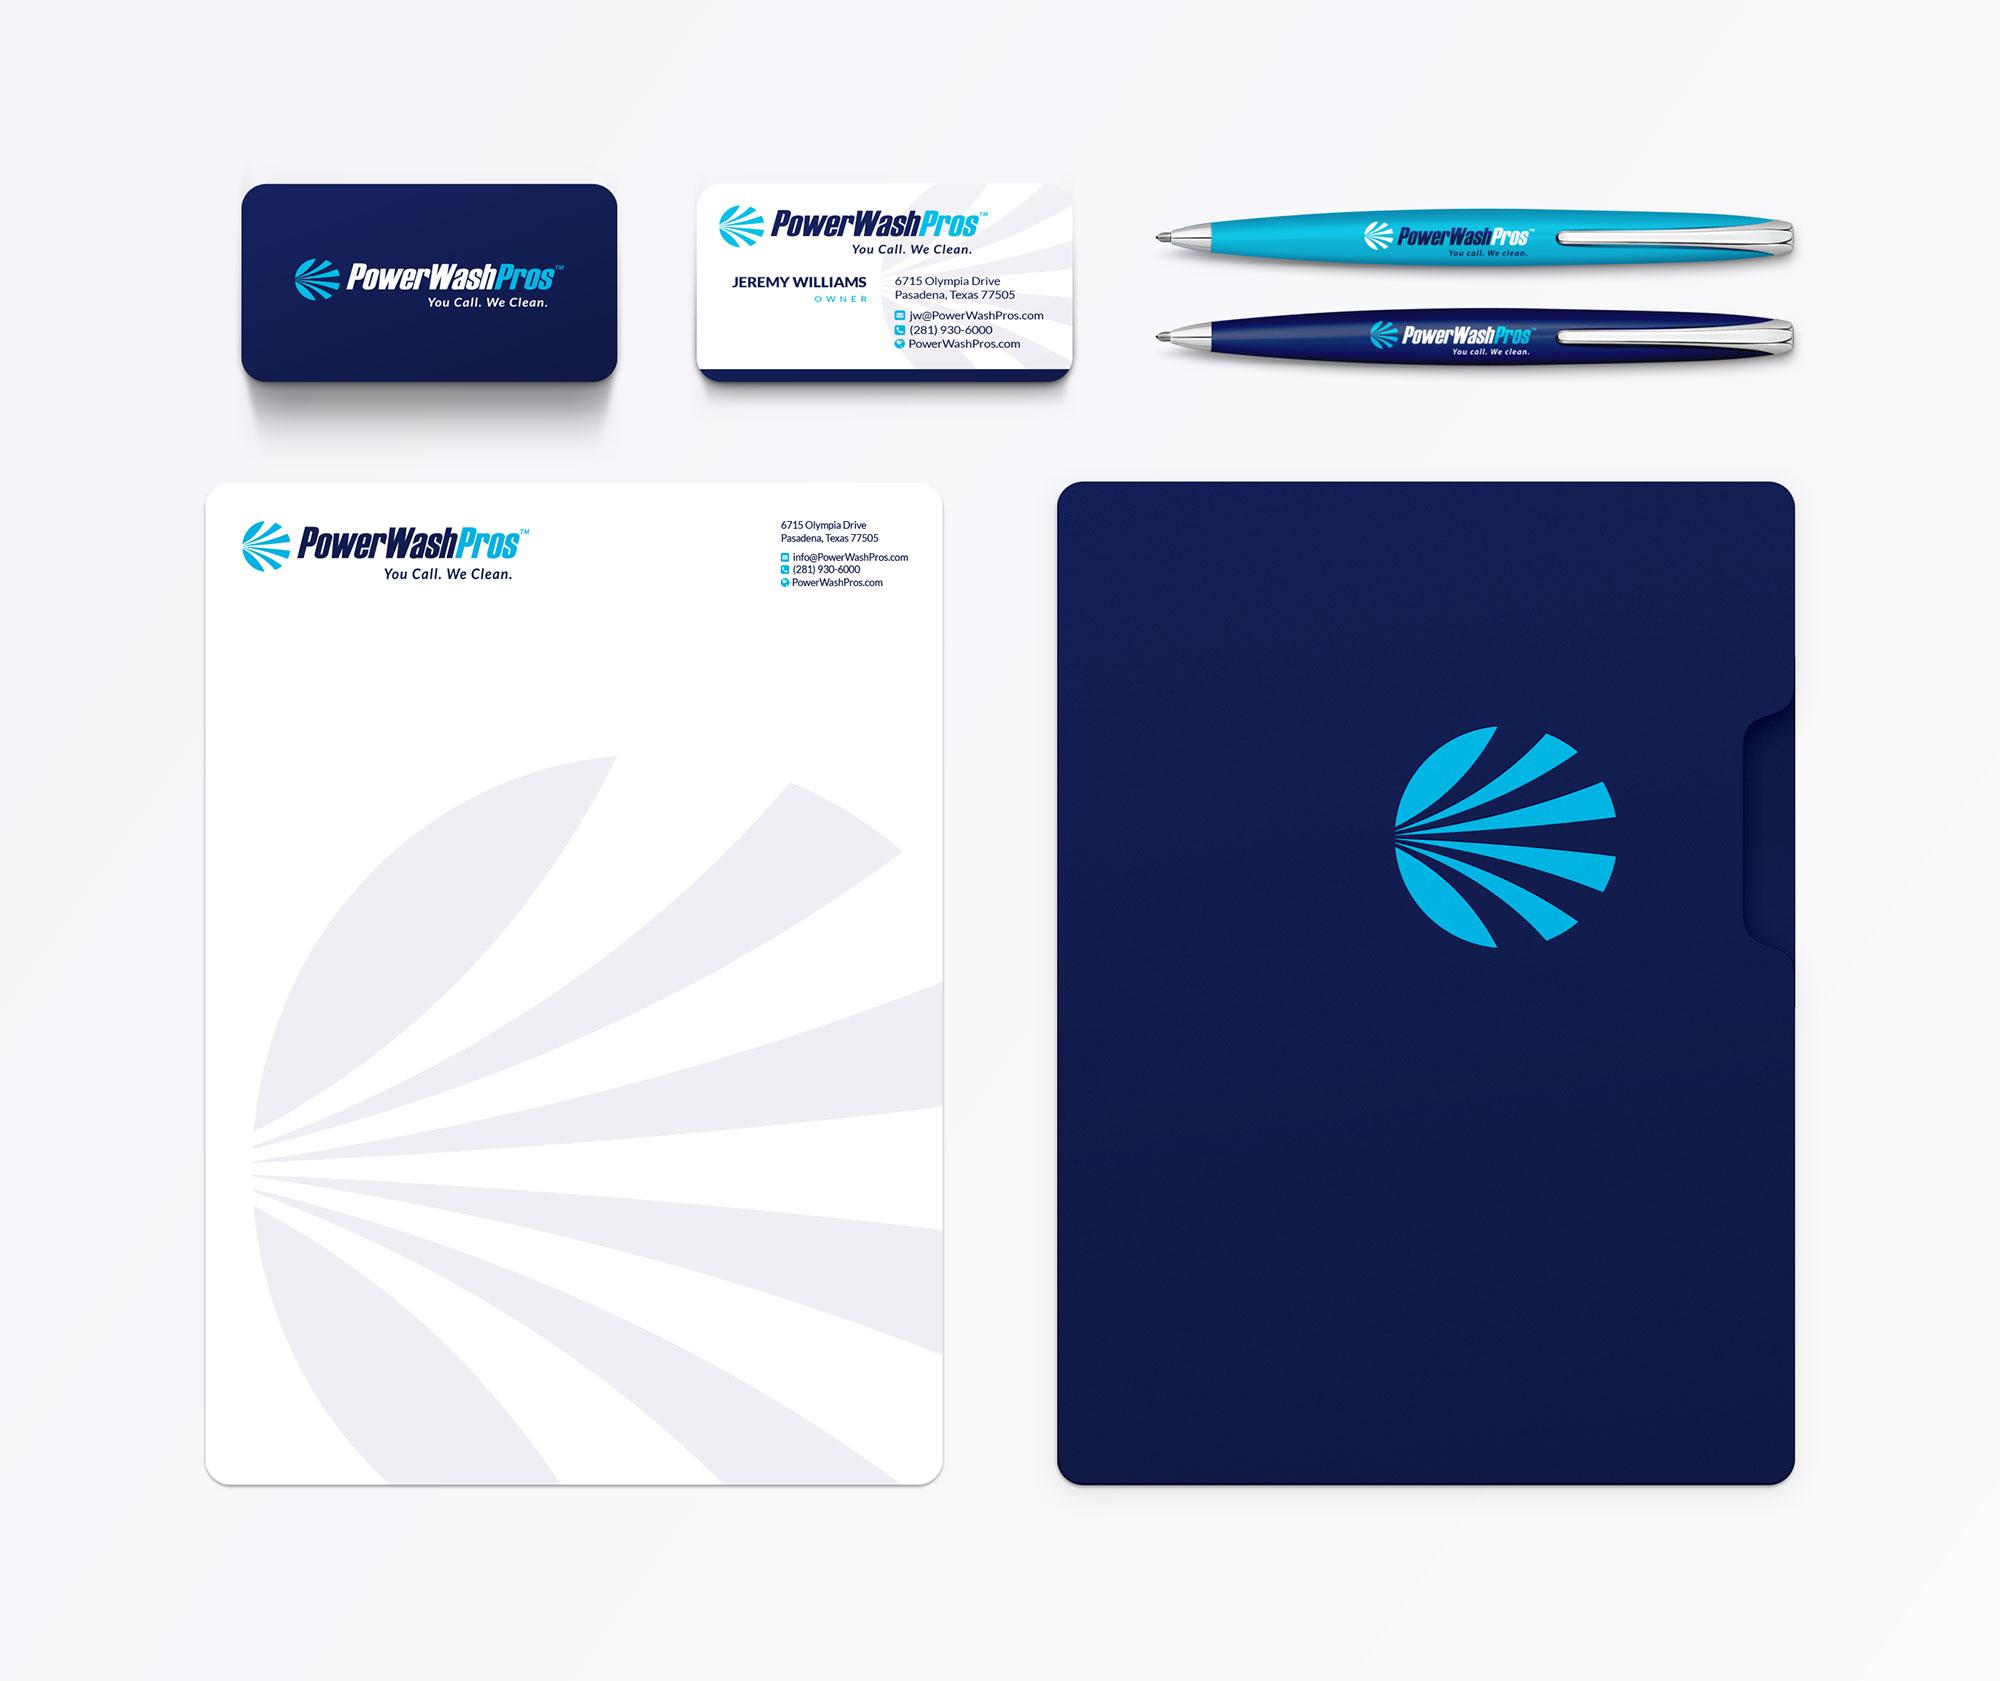 PWP Identity Design